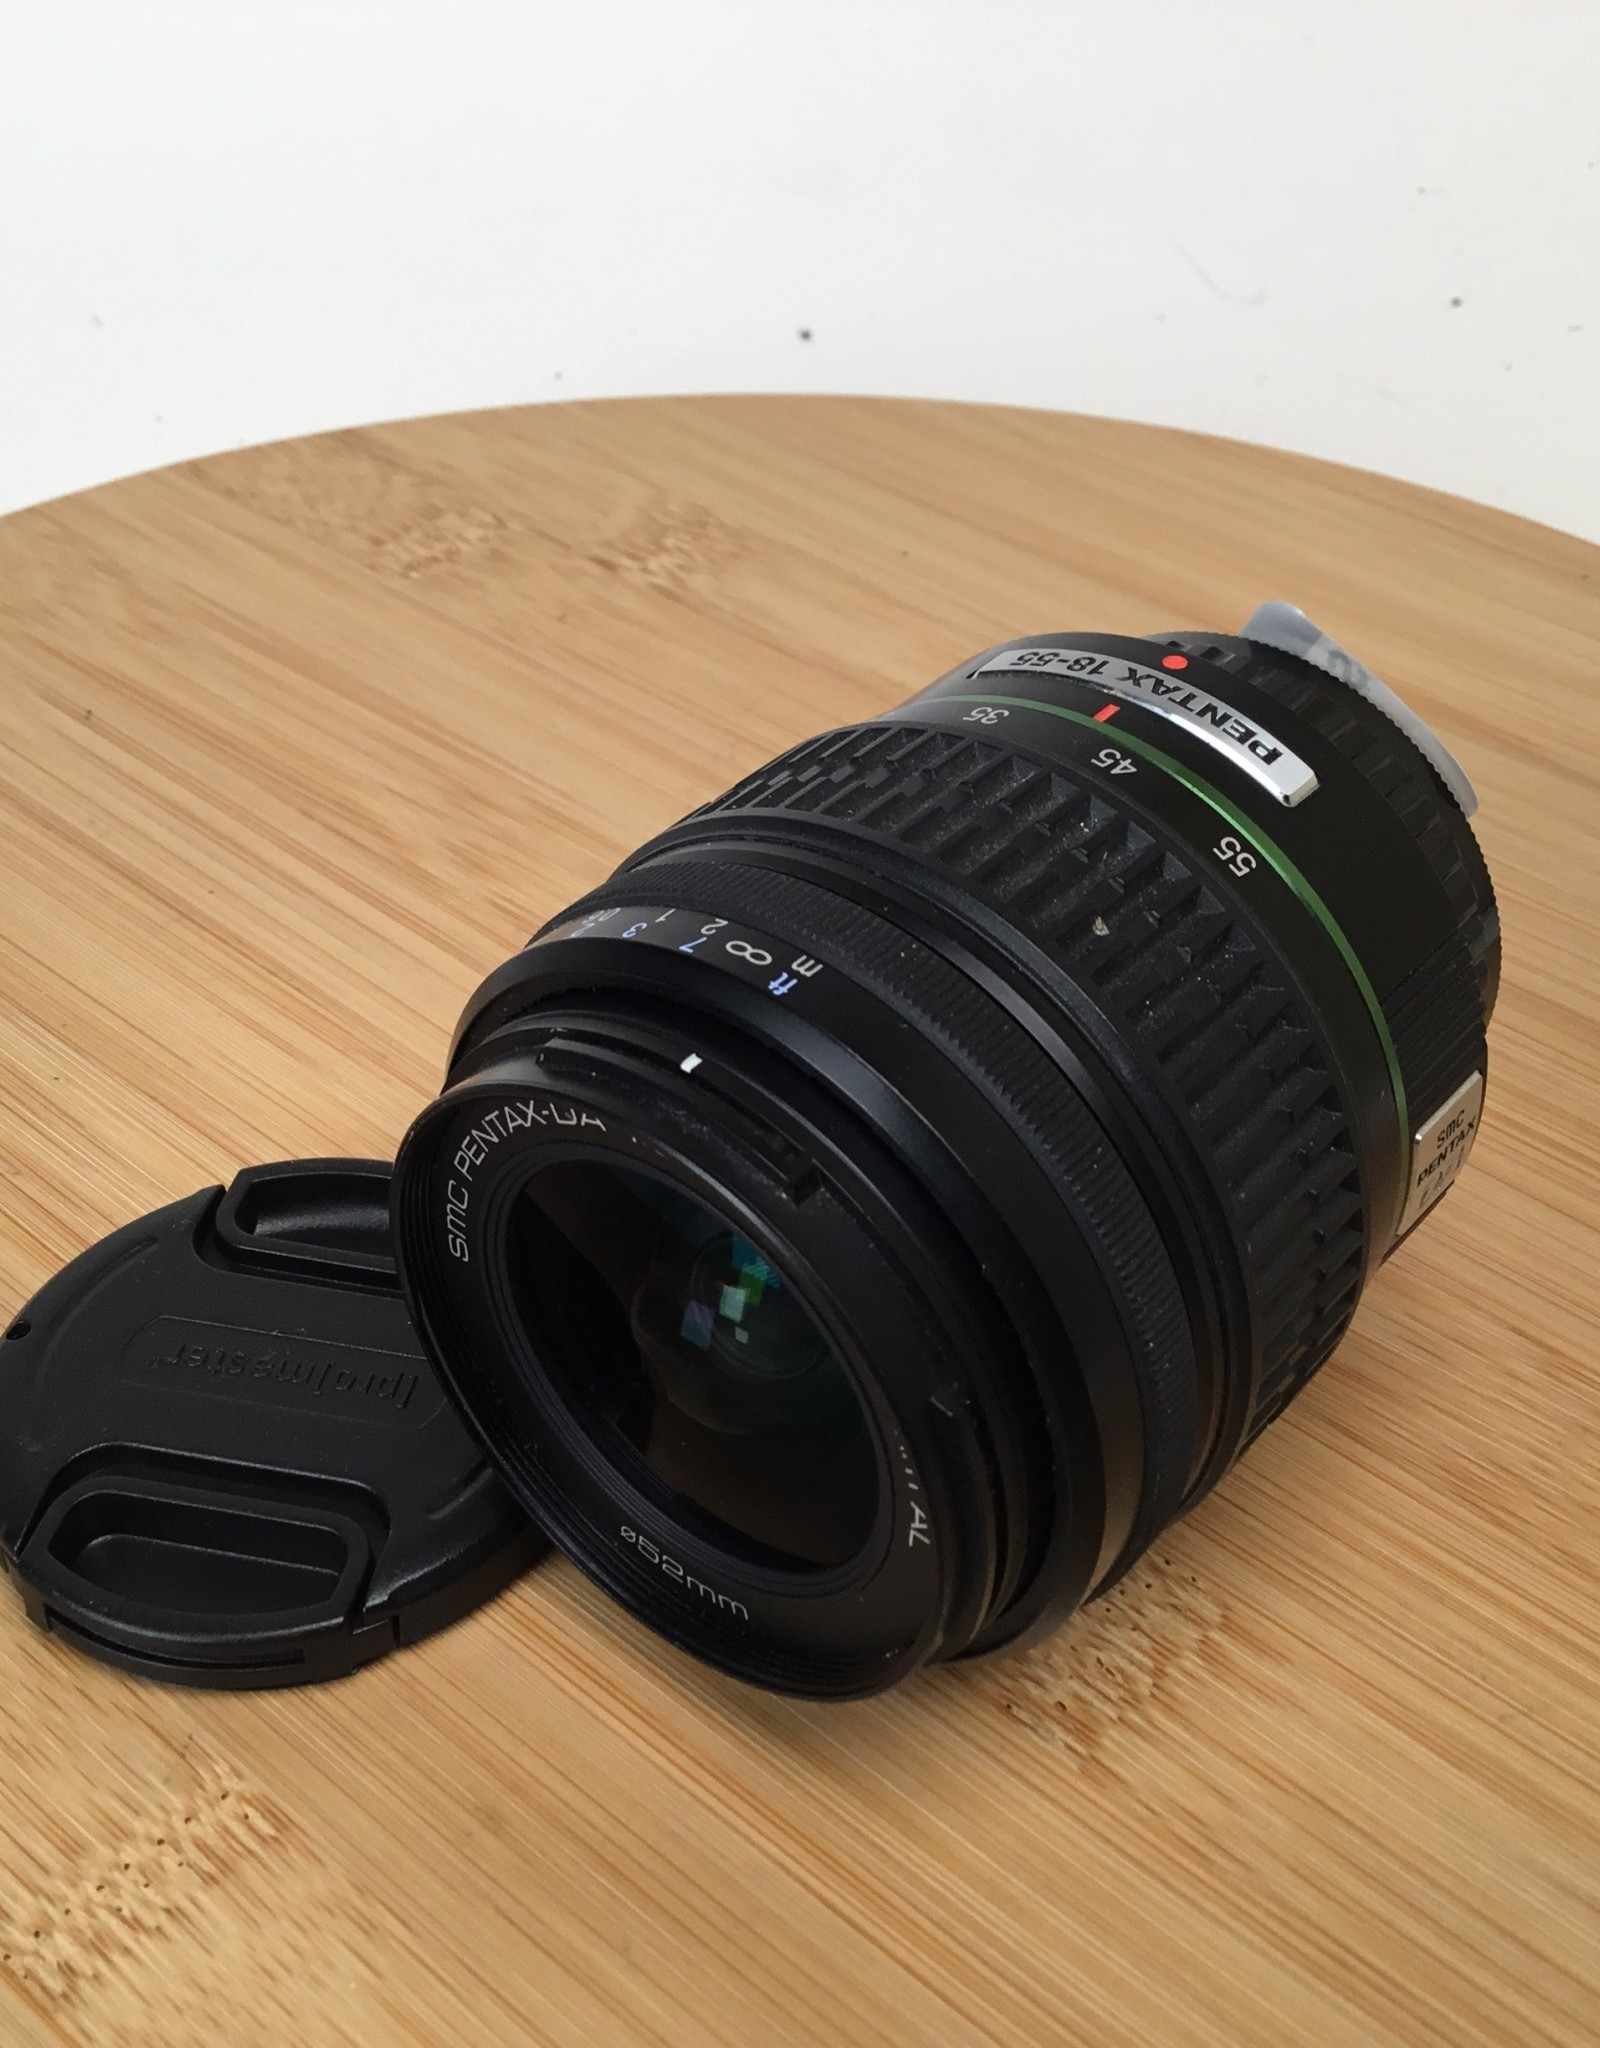 Pentax Pentax DA 18-55mm AL f3.5-5.6 Used EX